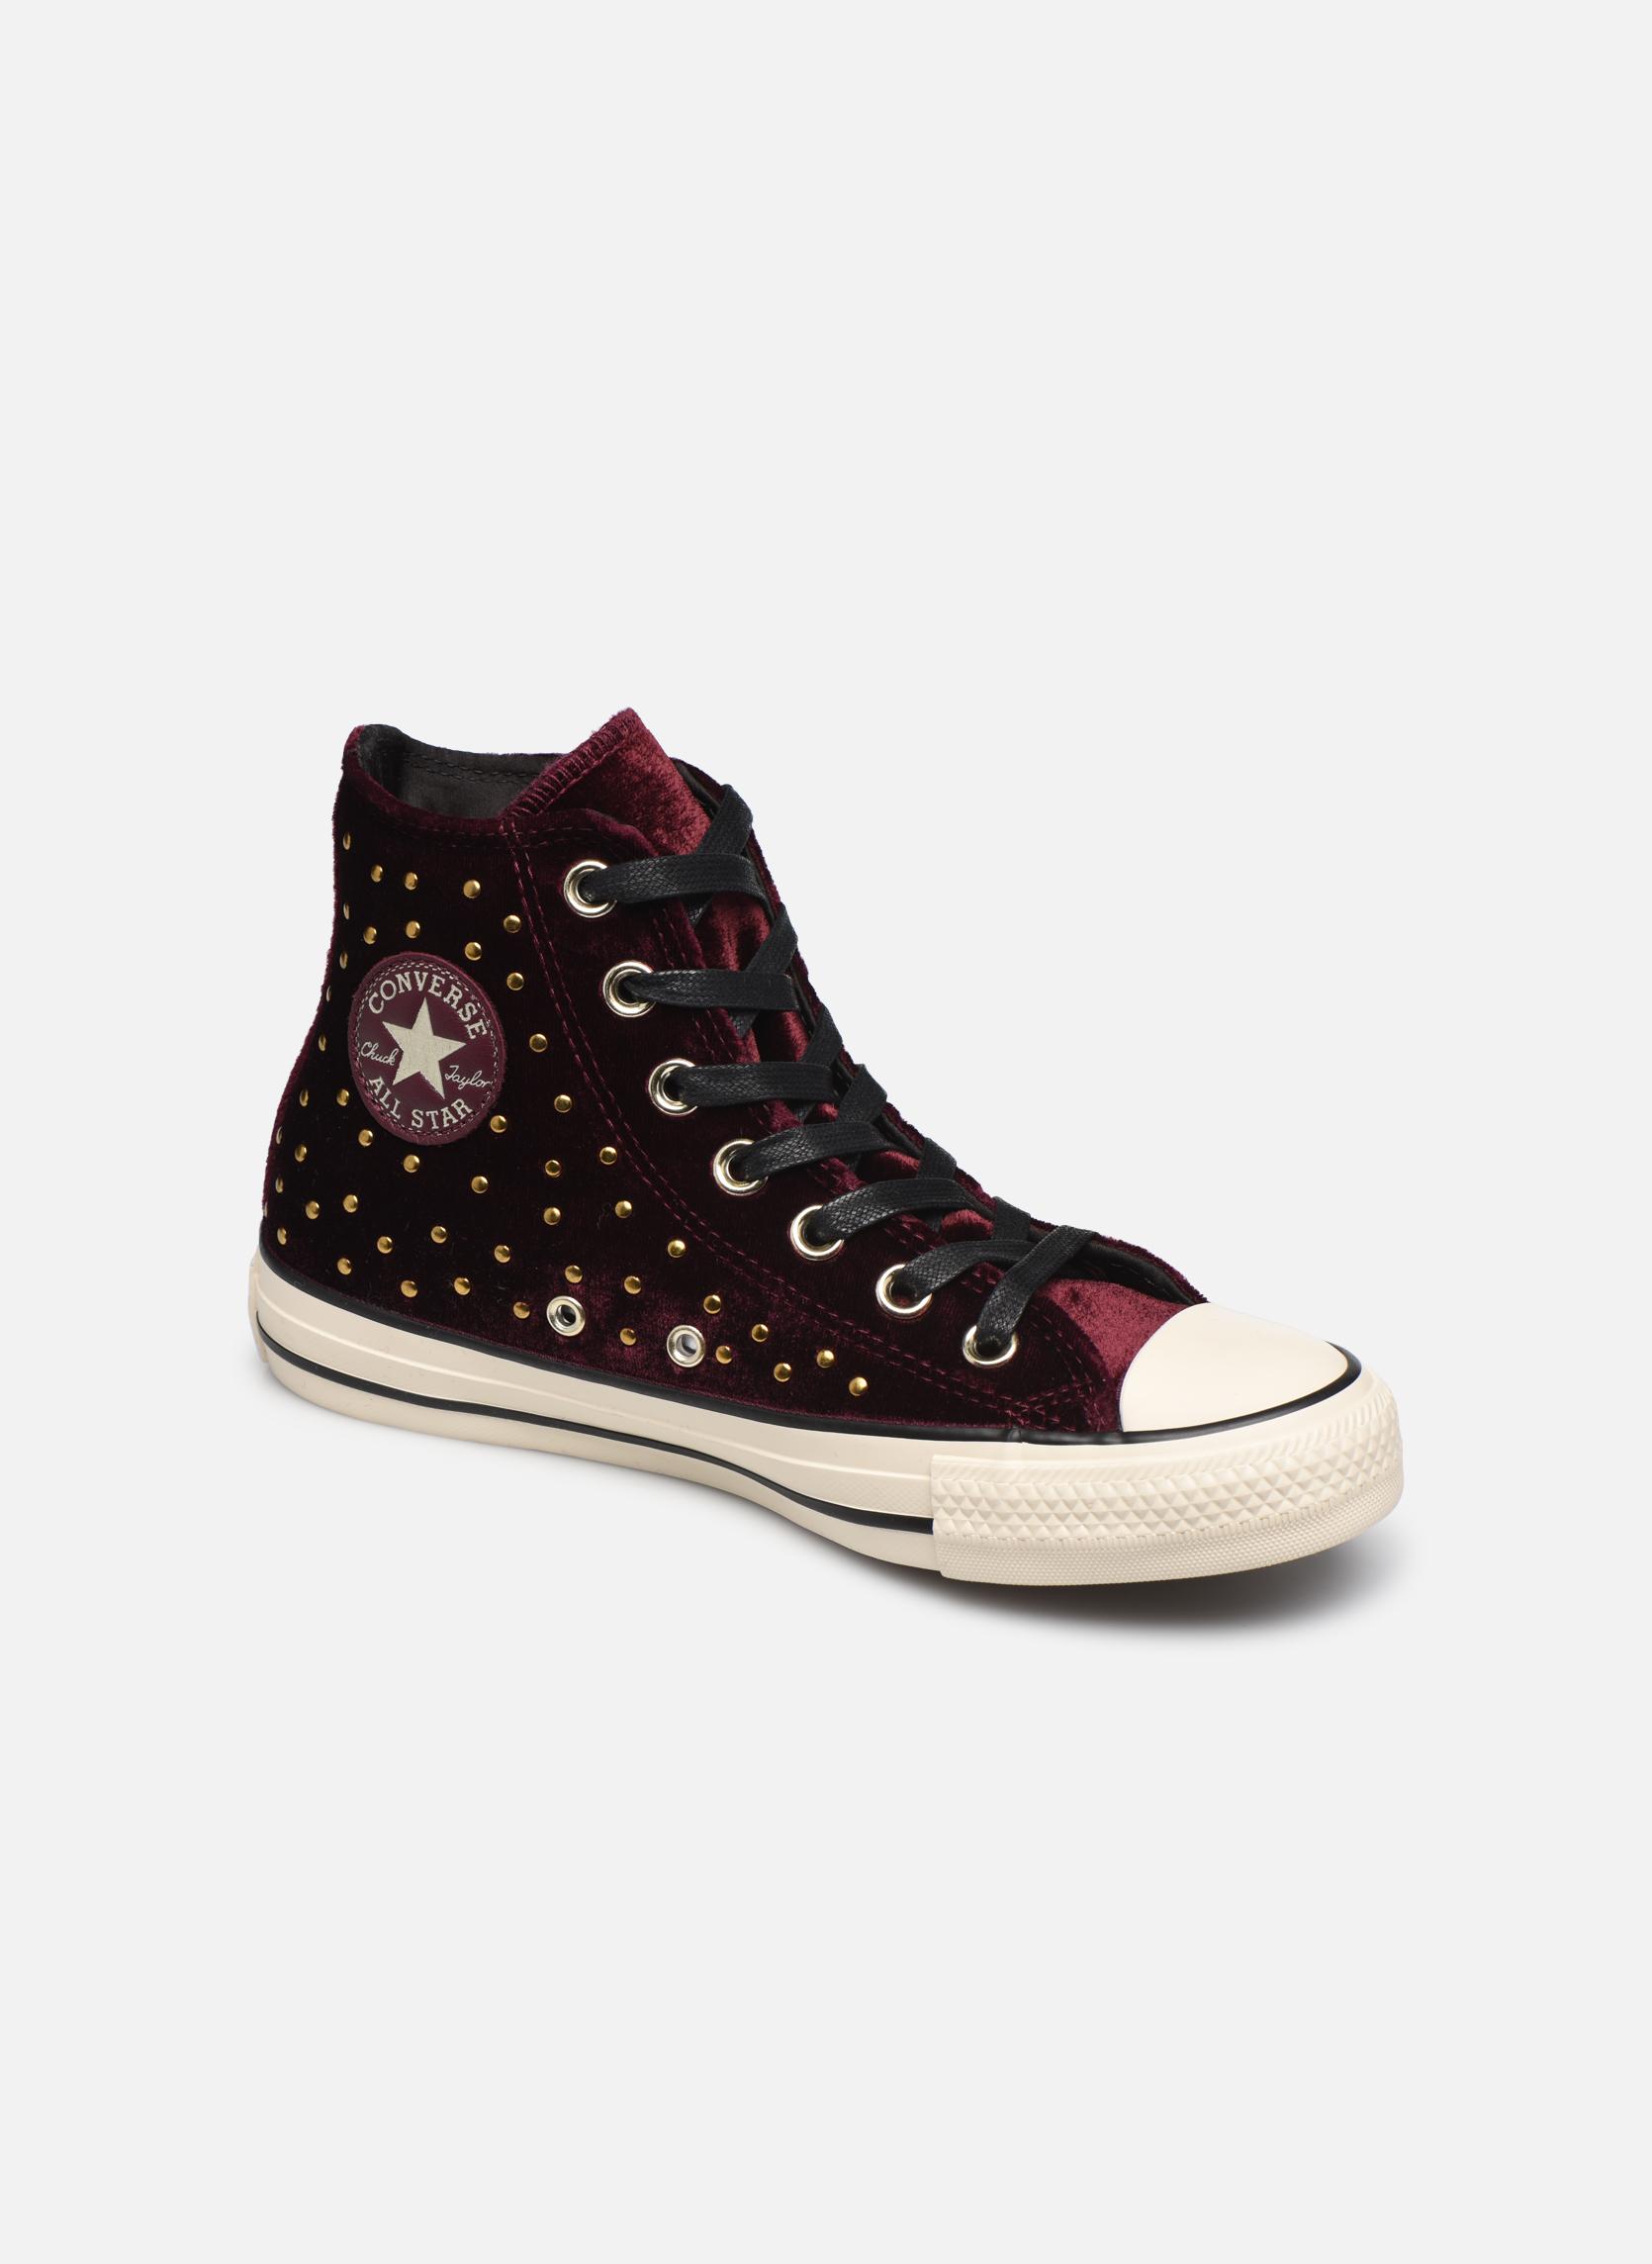 Hi Velvet black turtledove Sangria All Chuck Studs Dark Converse Star Taylor YBIcSw